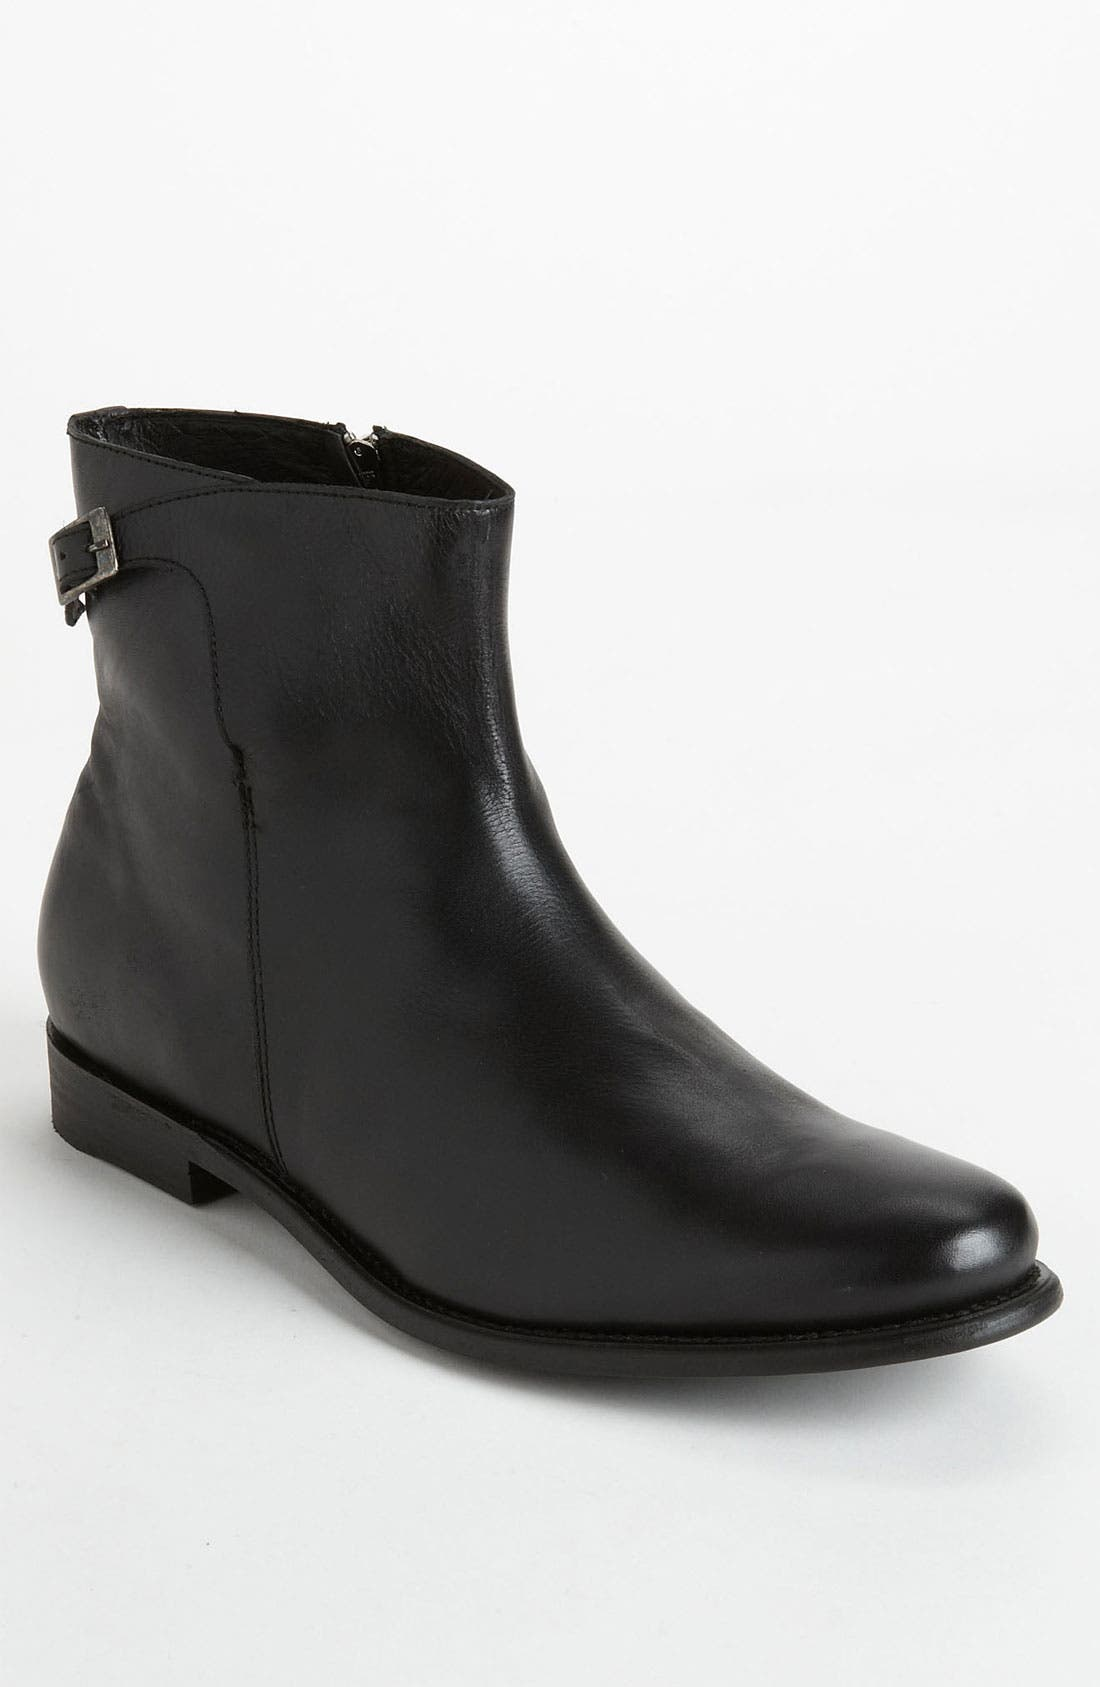 Main Image - J.D. Fisk 'Franky' Plain Toe Boot (Online Only)